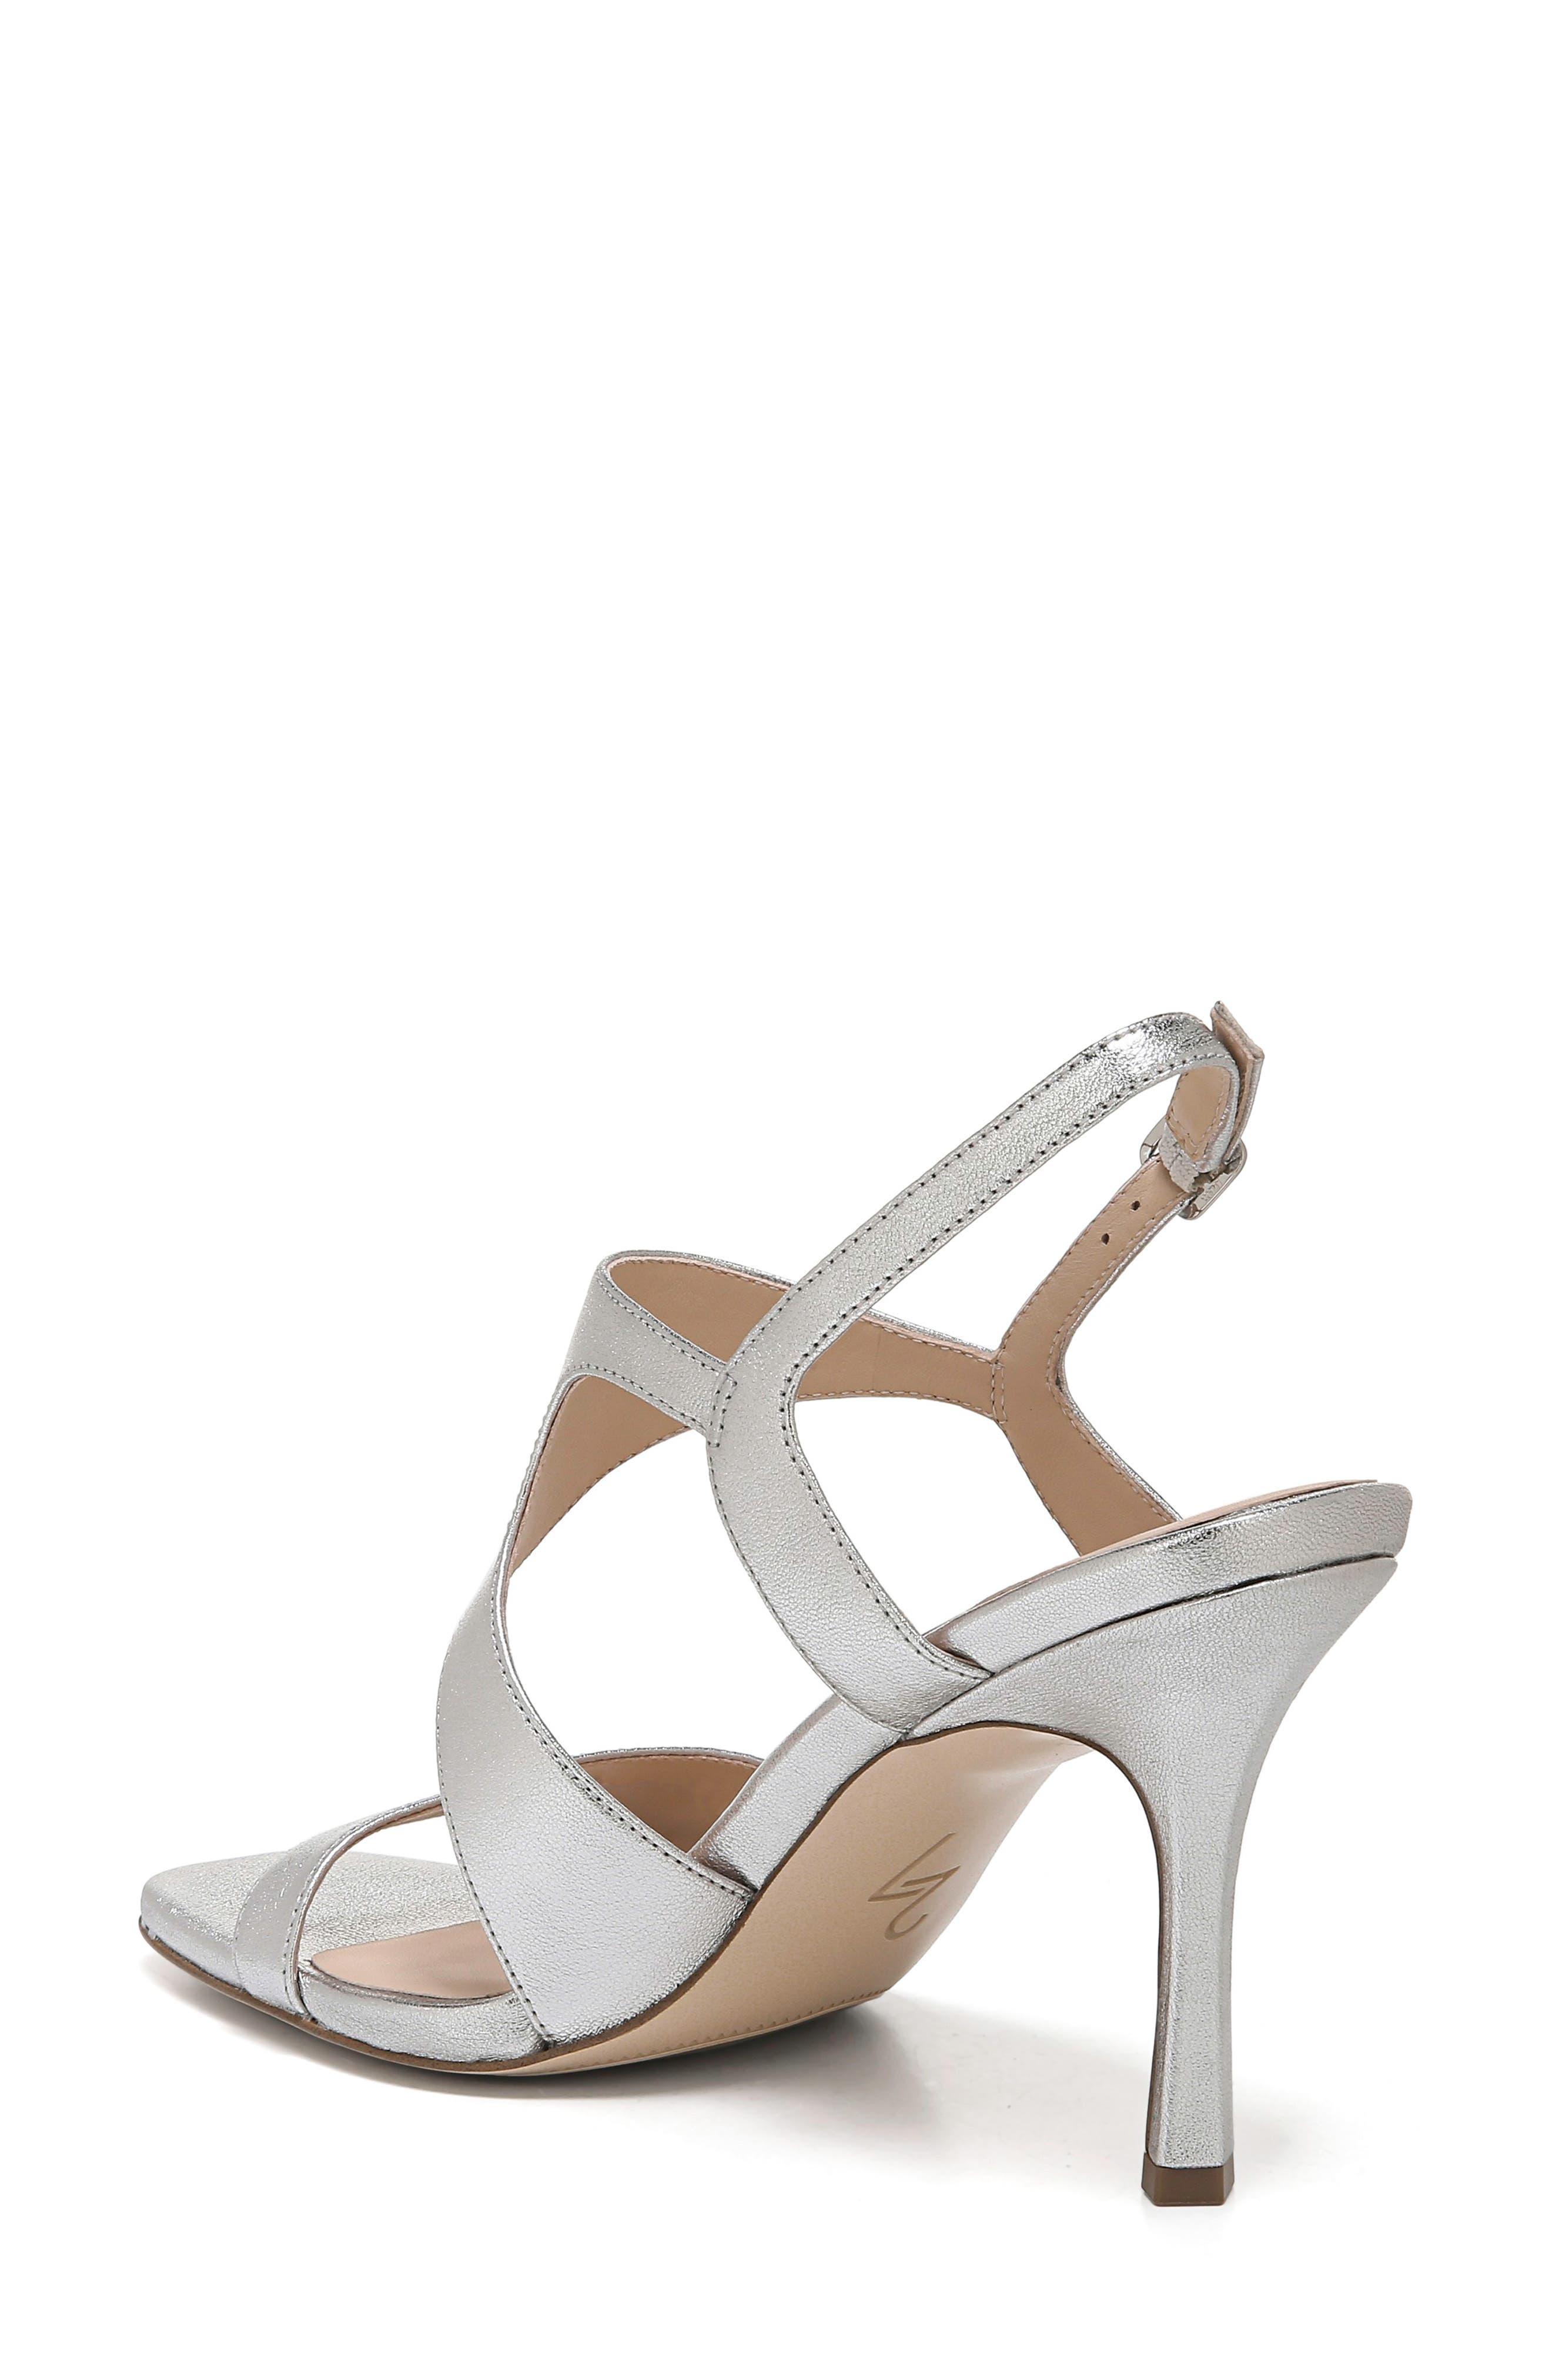 65af68c0c Women s 27 EDIT Sandals